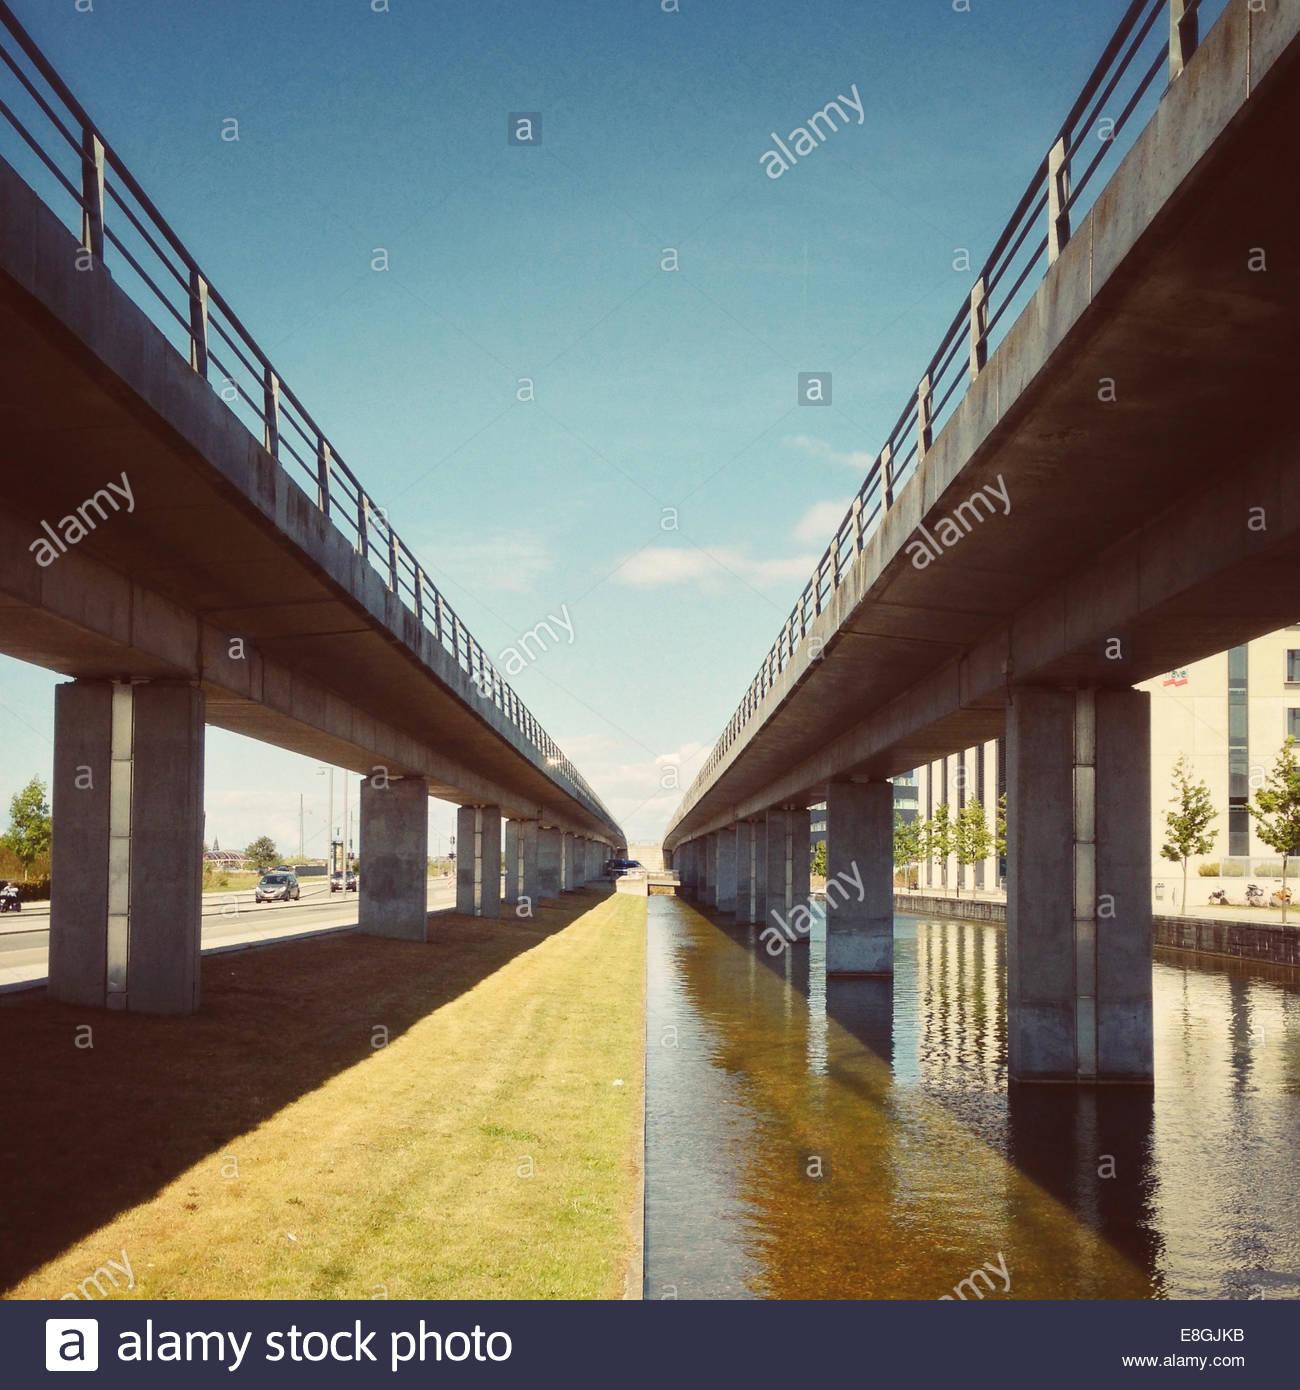 Denmark, Copenhagen, Elevated roads - Stock Image